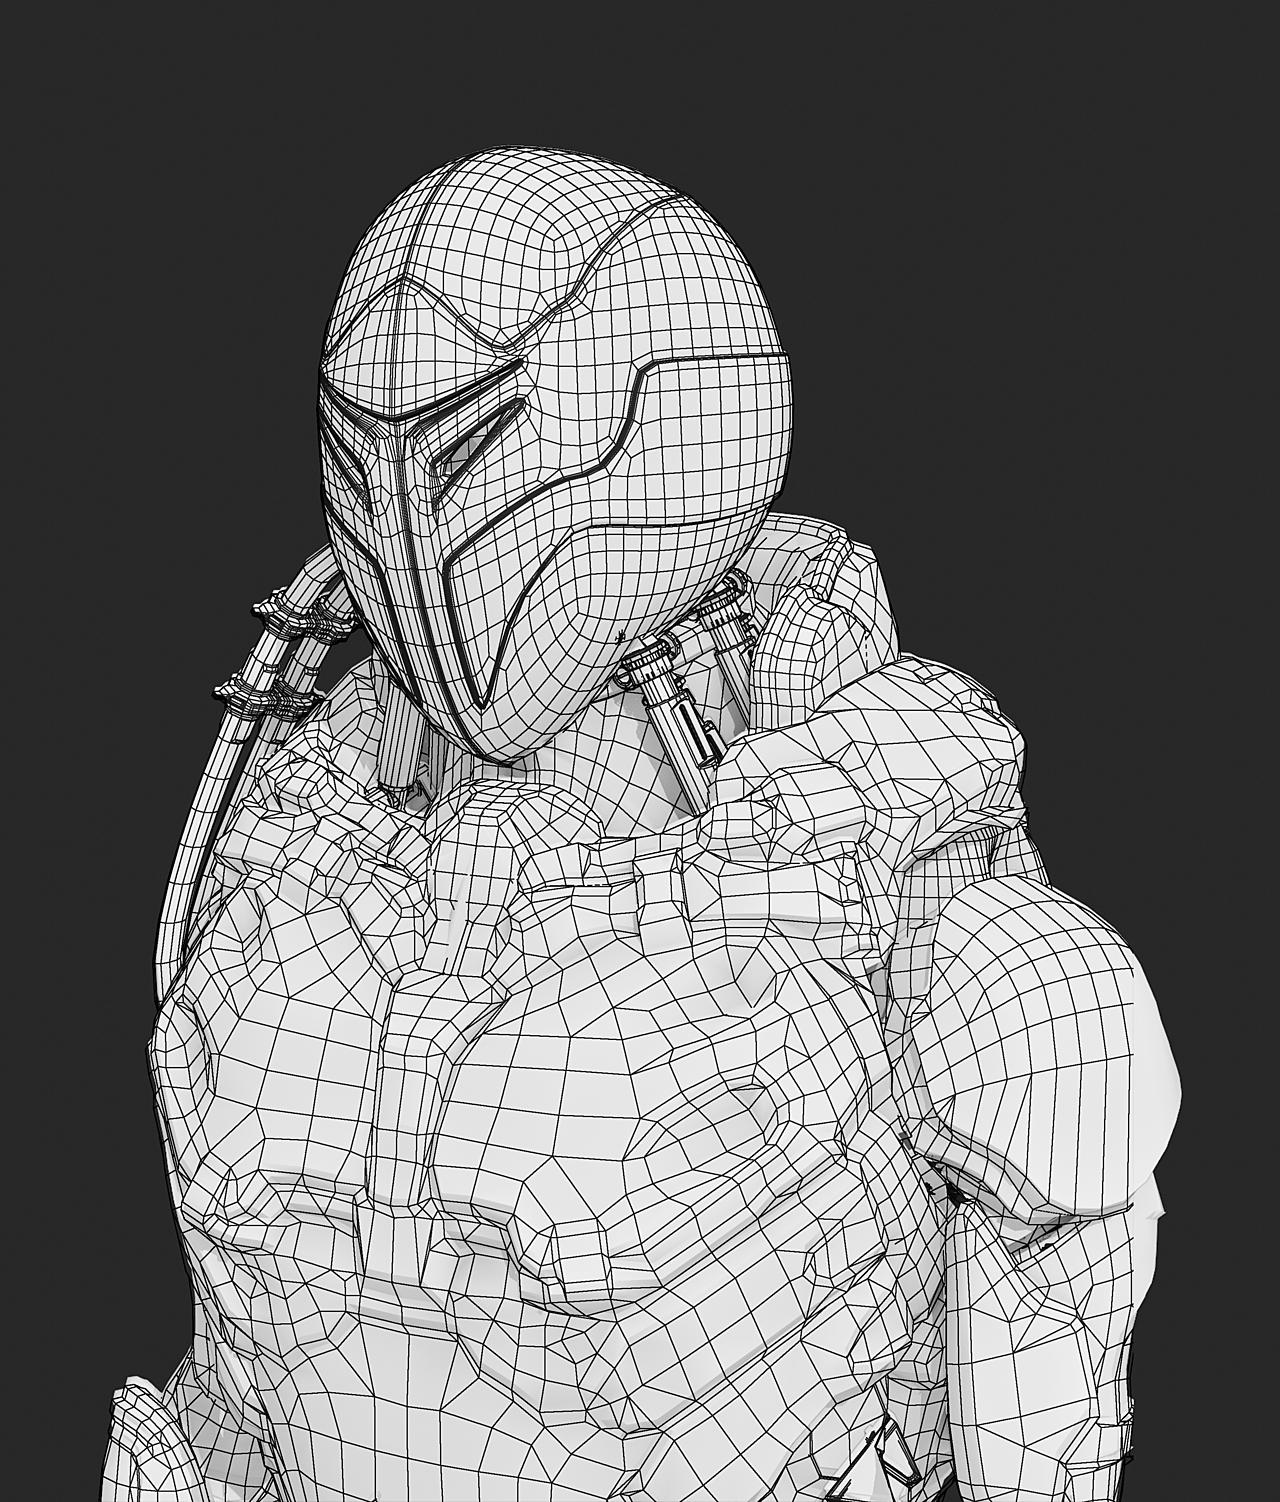 Mecha robot modeling